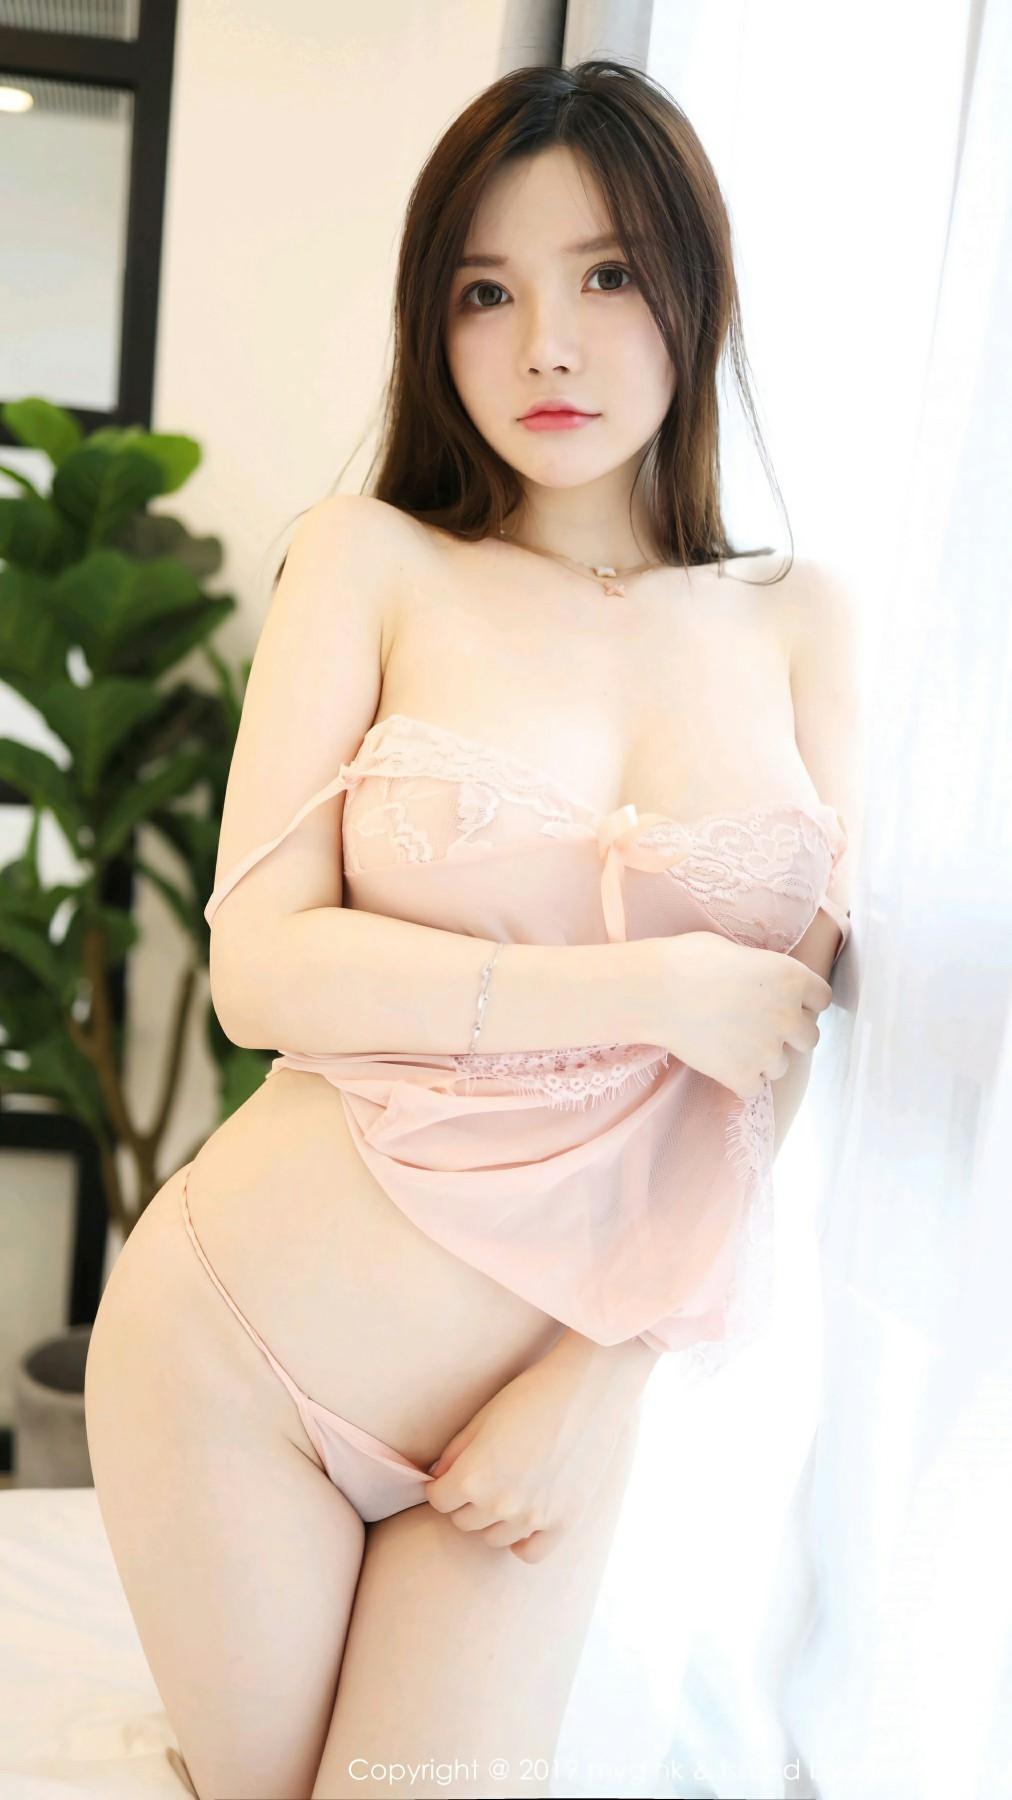 [MyGirl美媛馆]2019.08.07 VOL.378 糯美子Mini[60P] 美媛馆 第4张